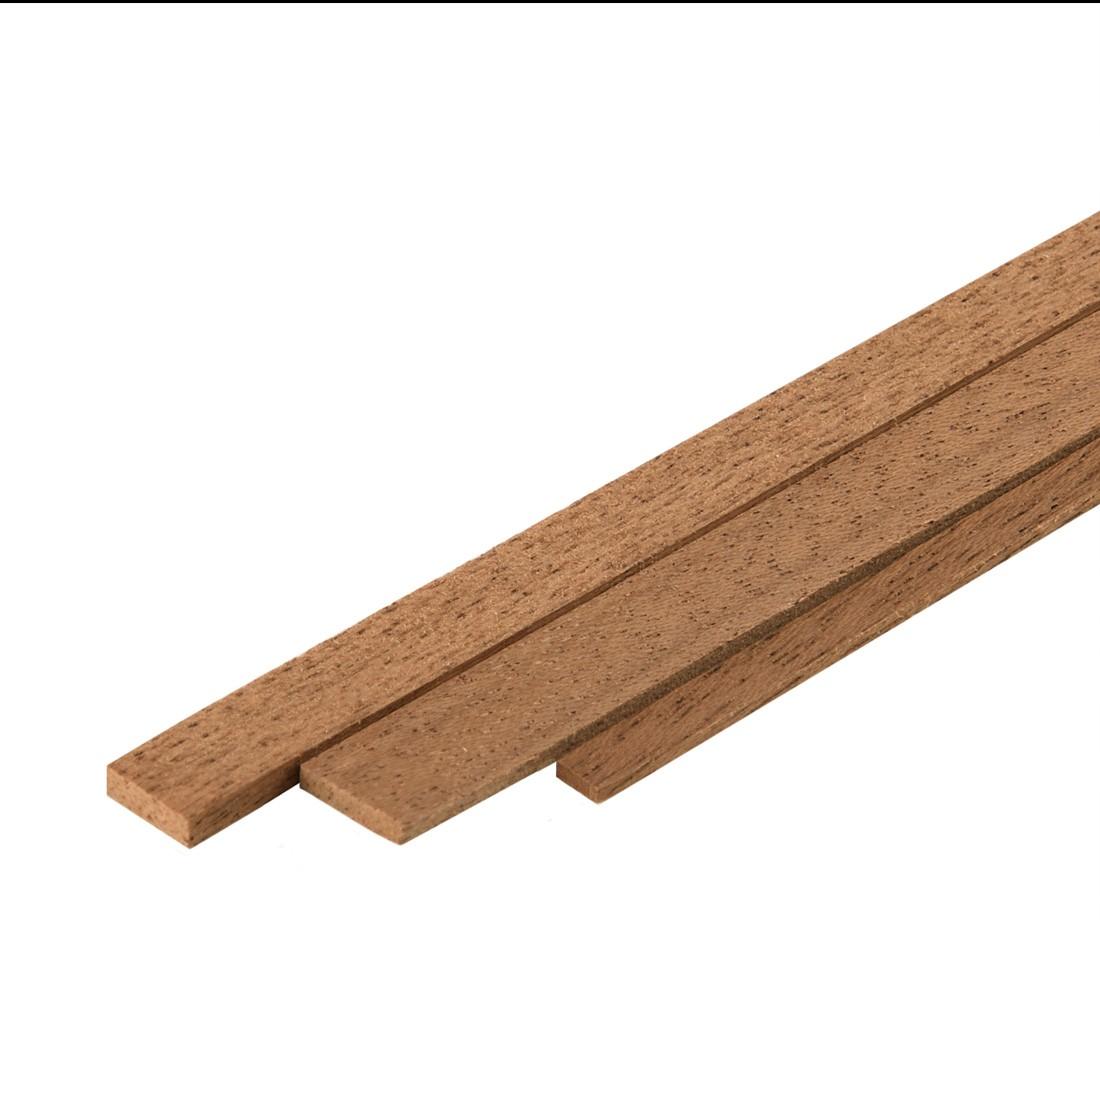 Baguettes dibetou mm.2x4